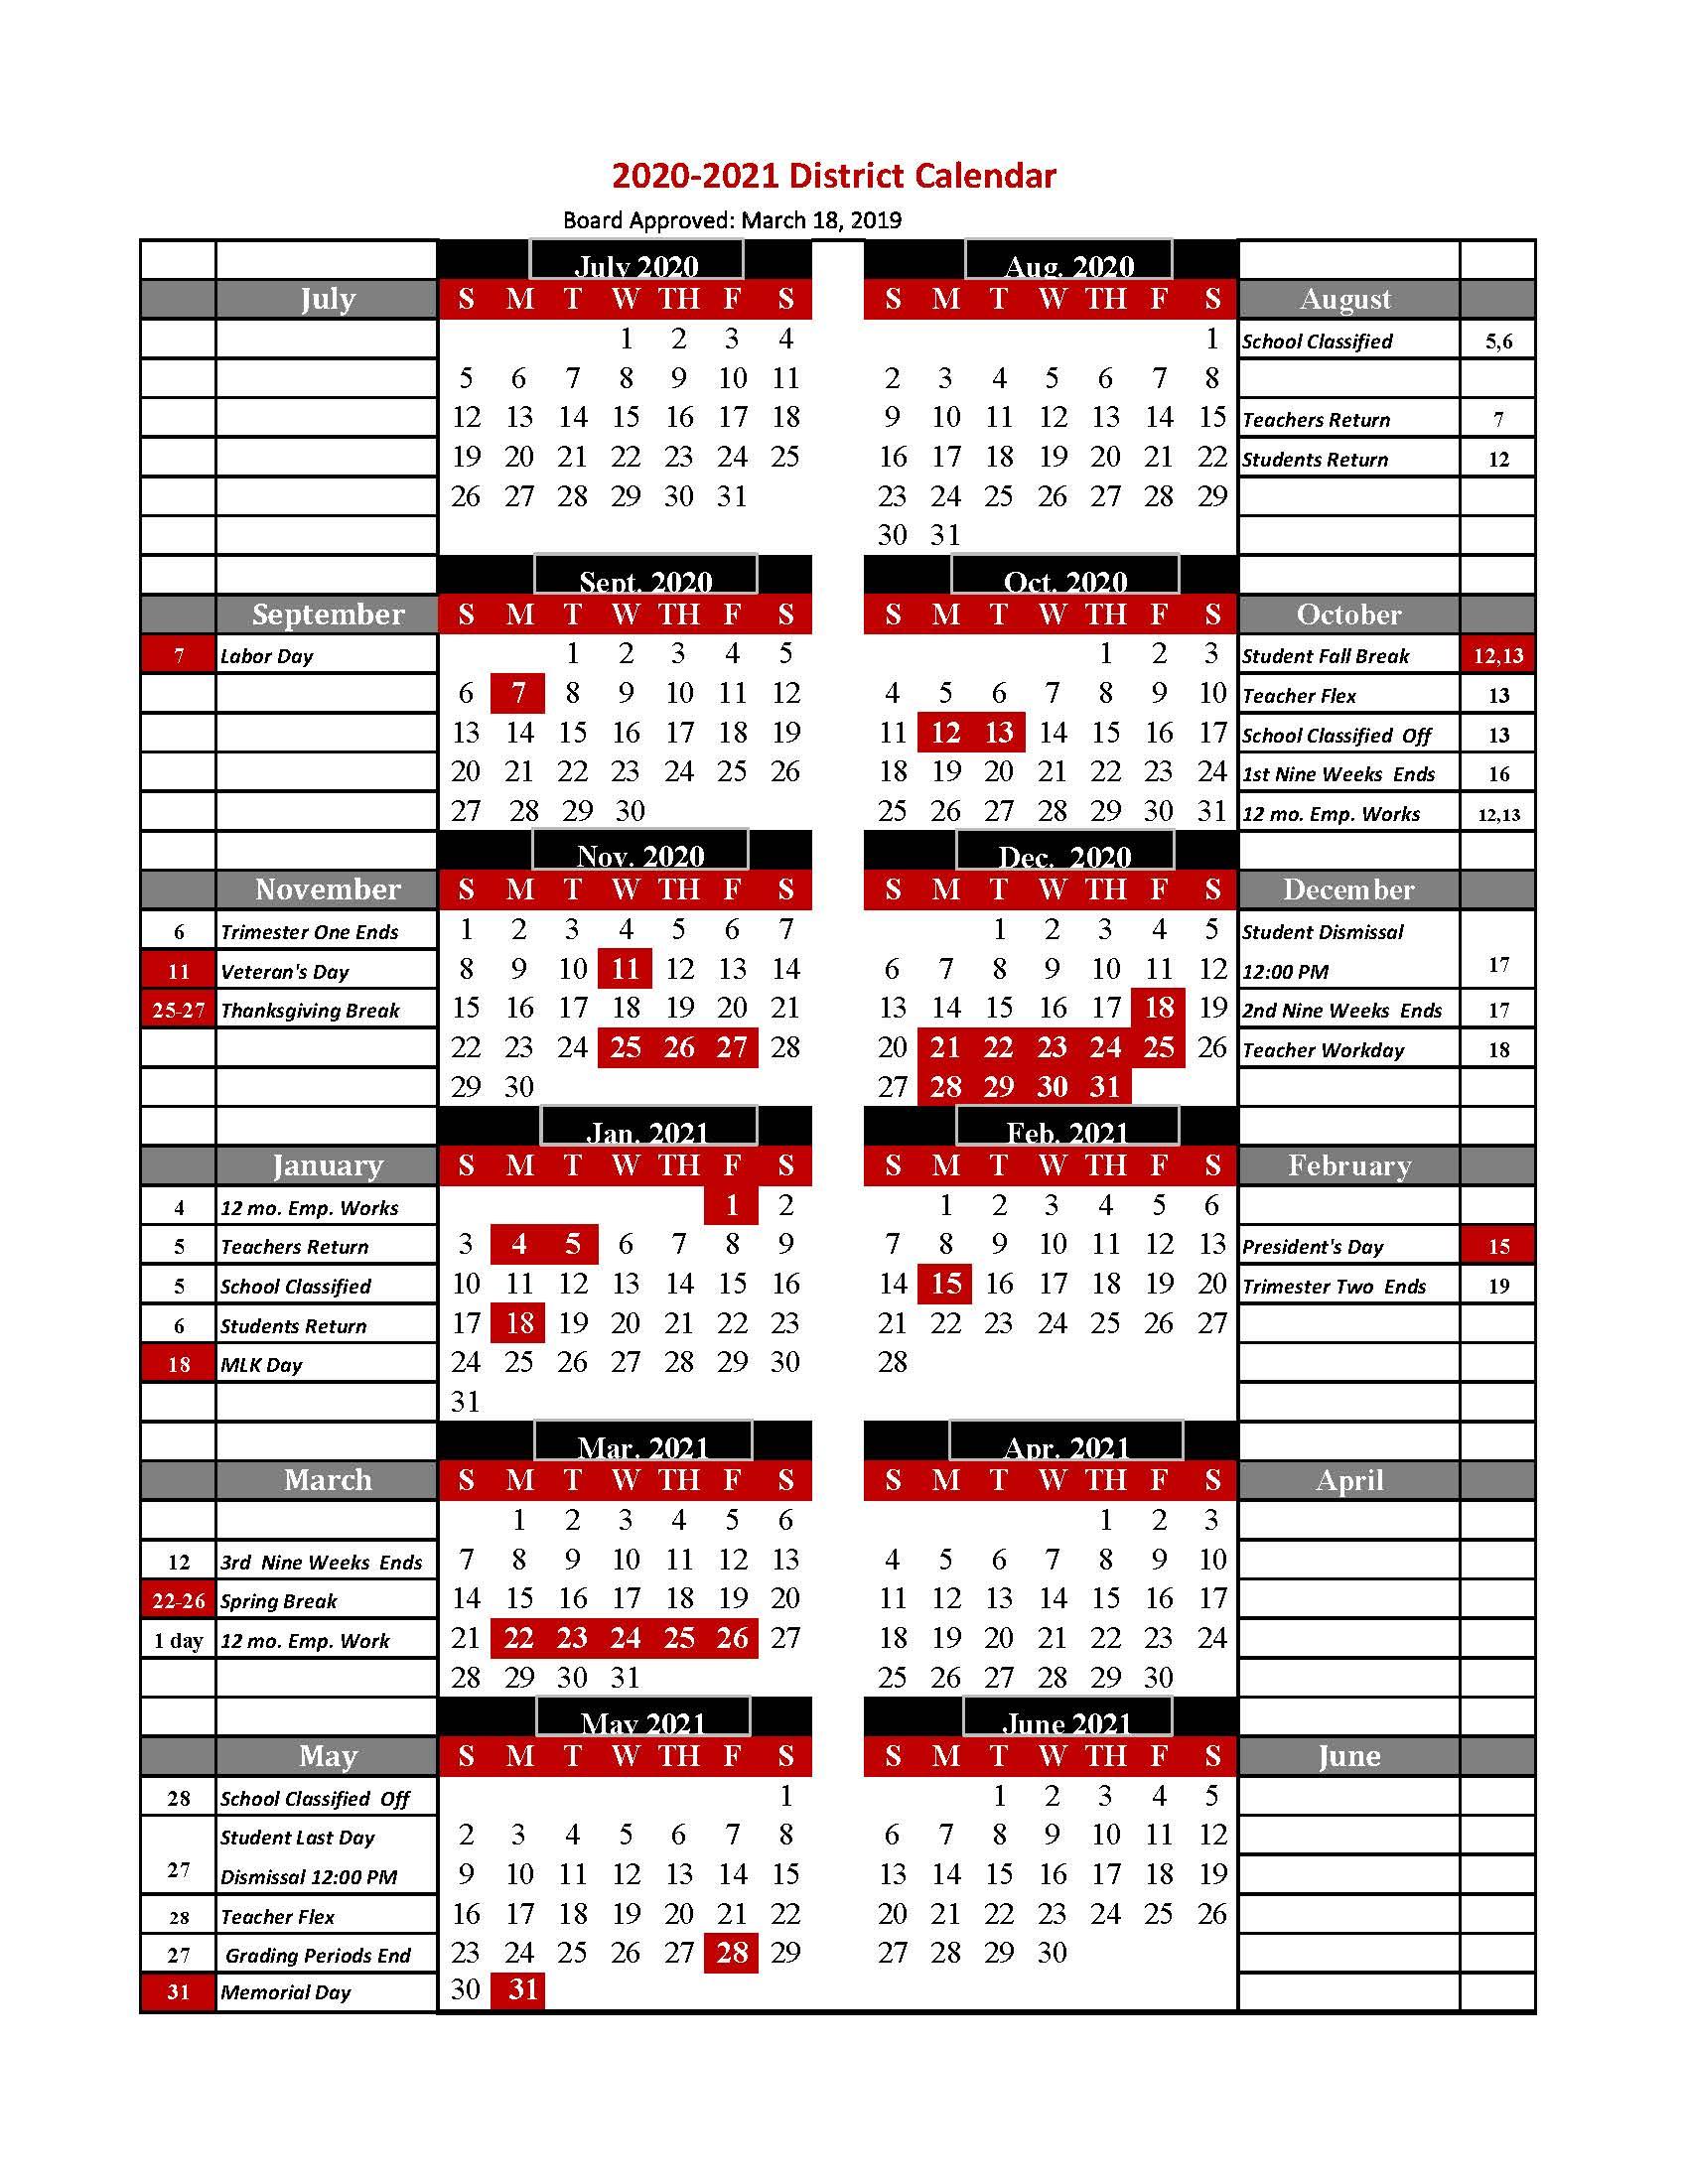 Tcs Calendar 2020 2021 / 2020 2021 Tcs Calendar Regarding Chamberlain Academic Calendar 2020